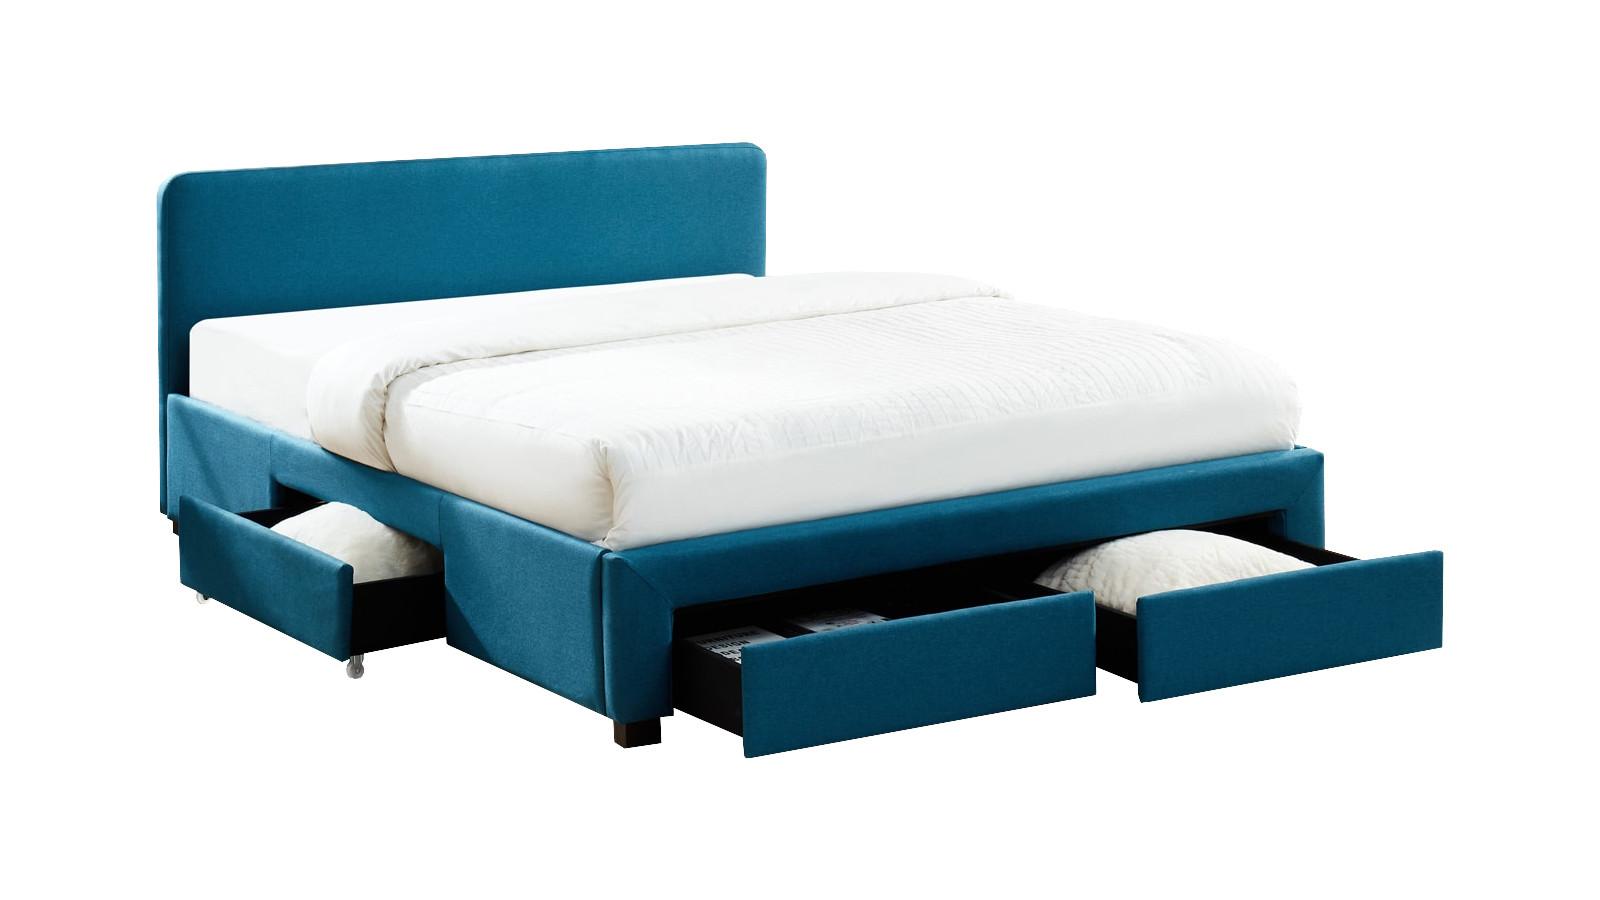 Lit à tiroirs en tissu bleu canard 160x200 avec sommier et tête de lit